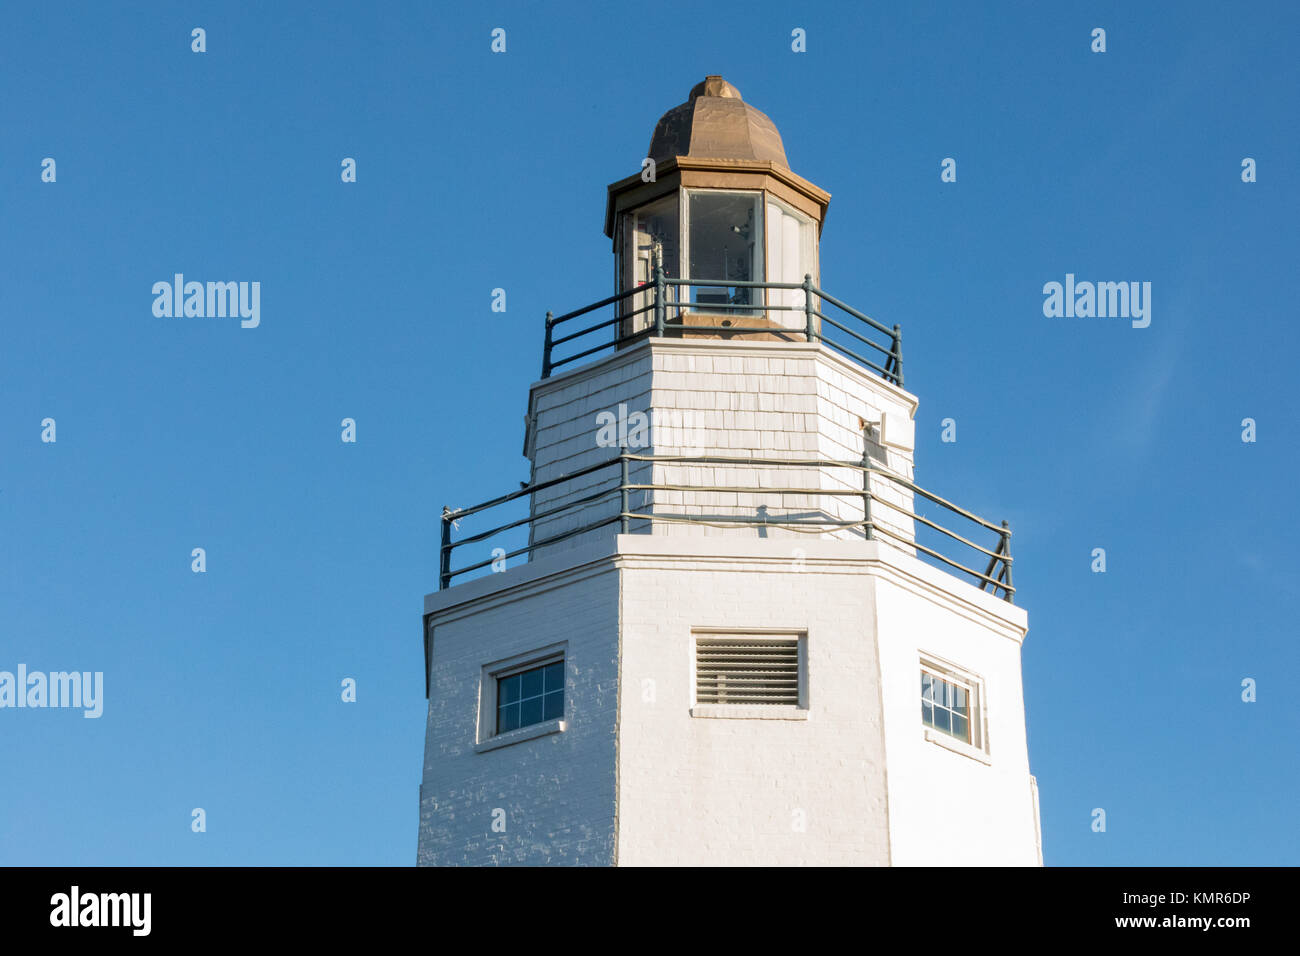 Light house in eastern long island, ny, USA - Stock Image